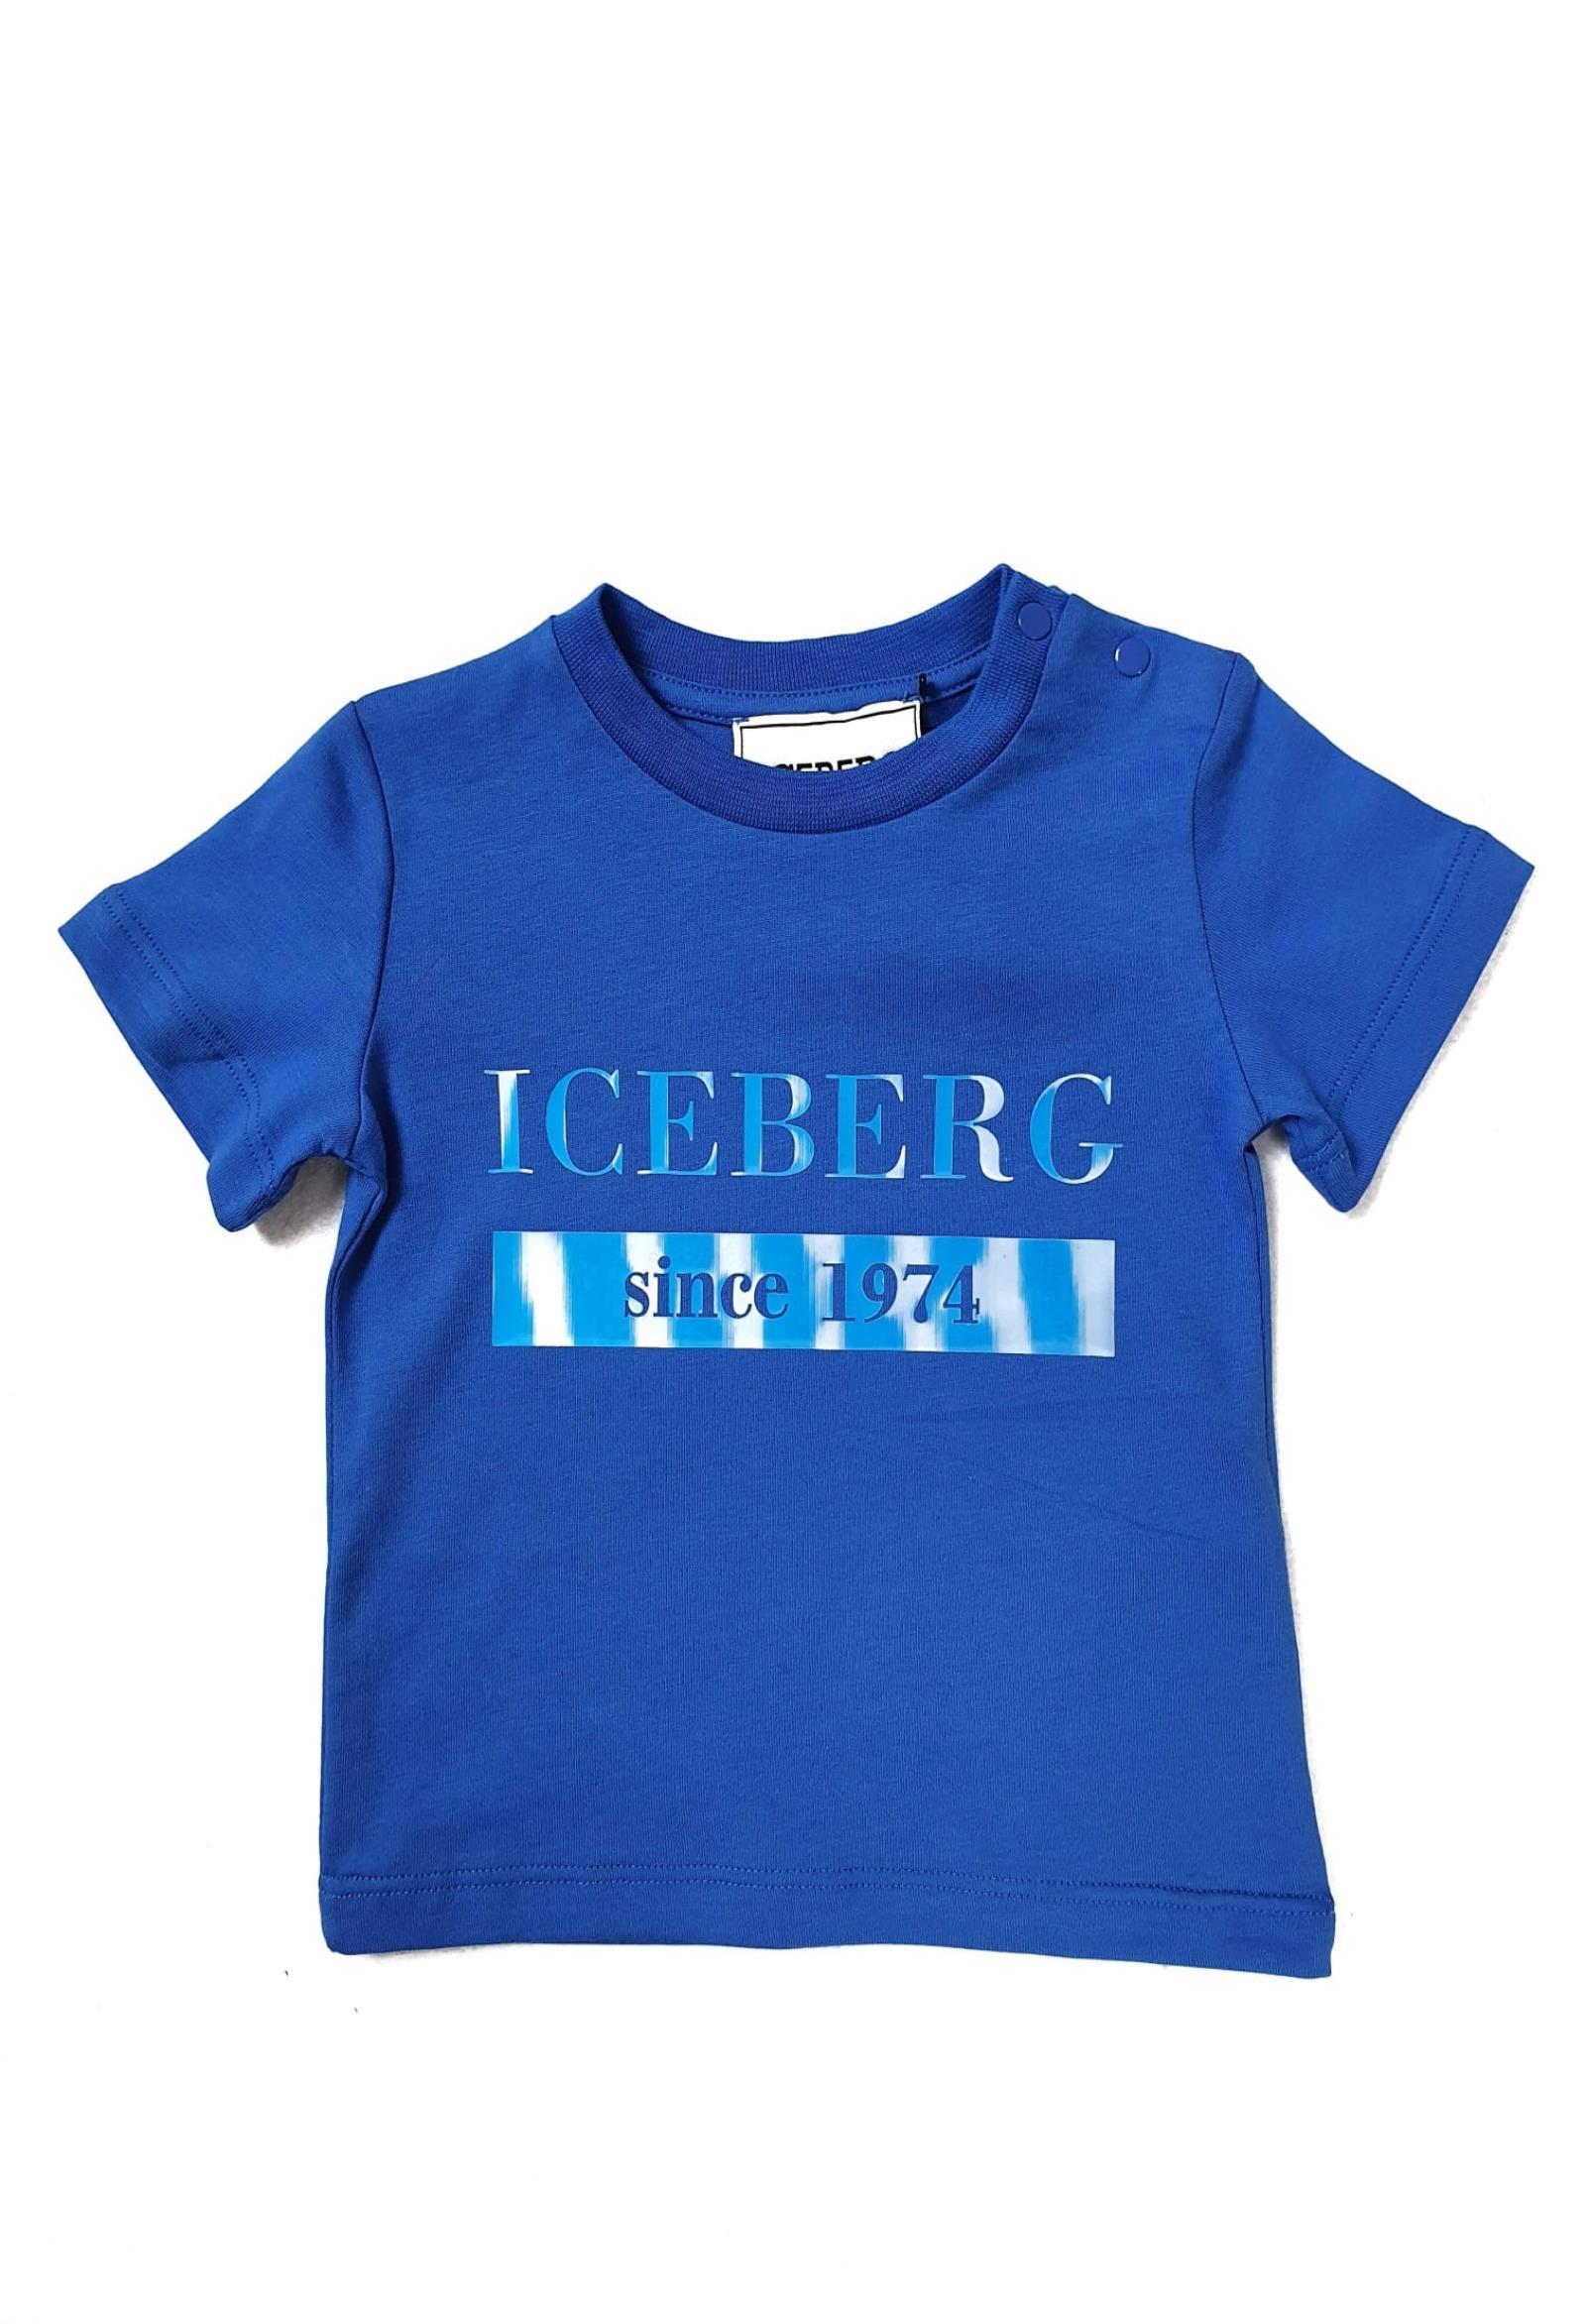 T-SHIRT BLUETTE CON LOGO REFLEX iceberg | T-shirt | TSICE1117BUNI